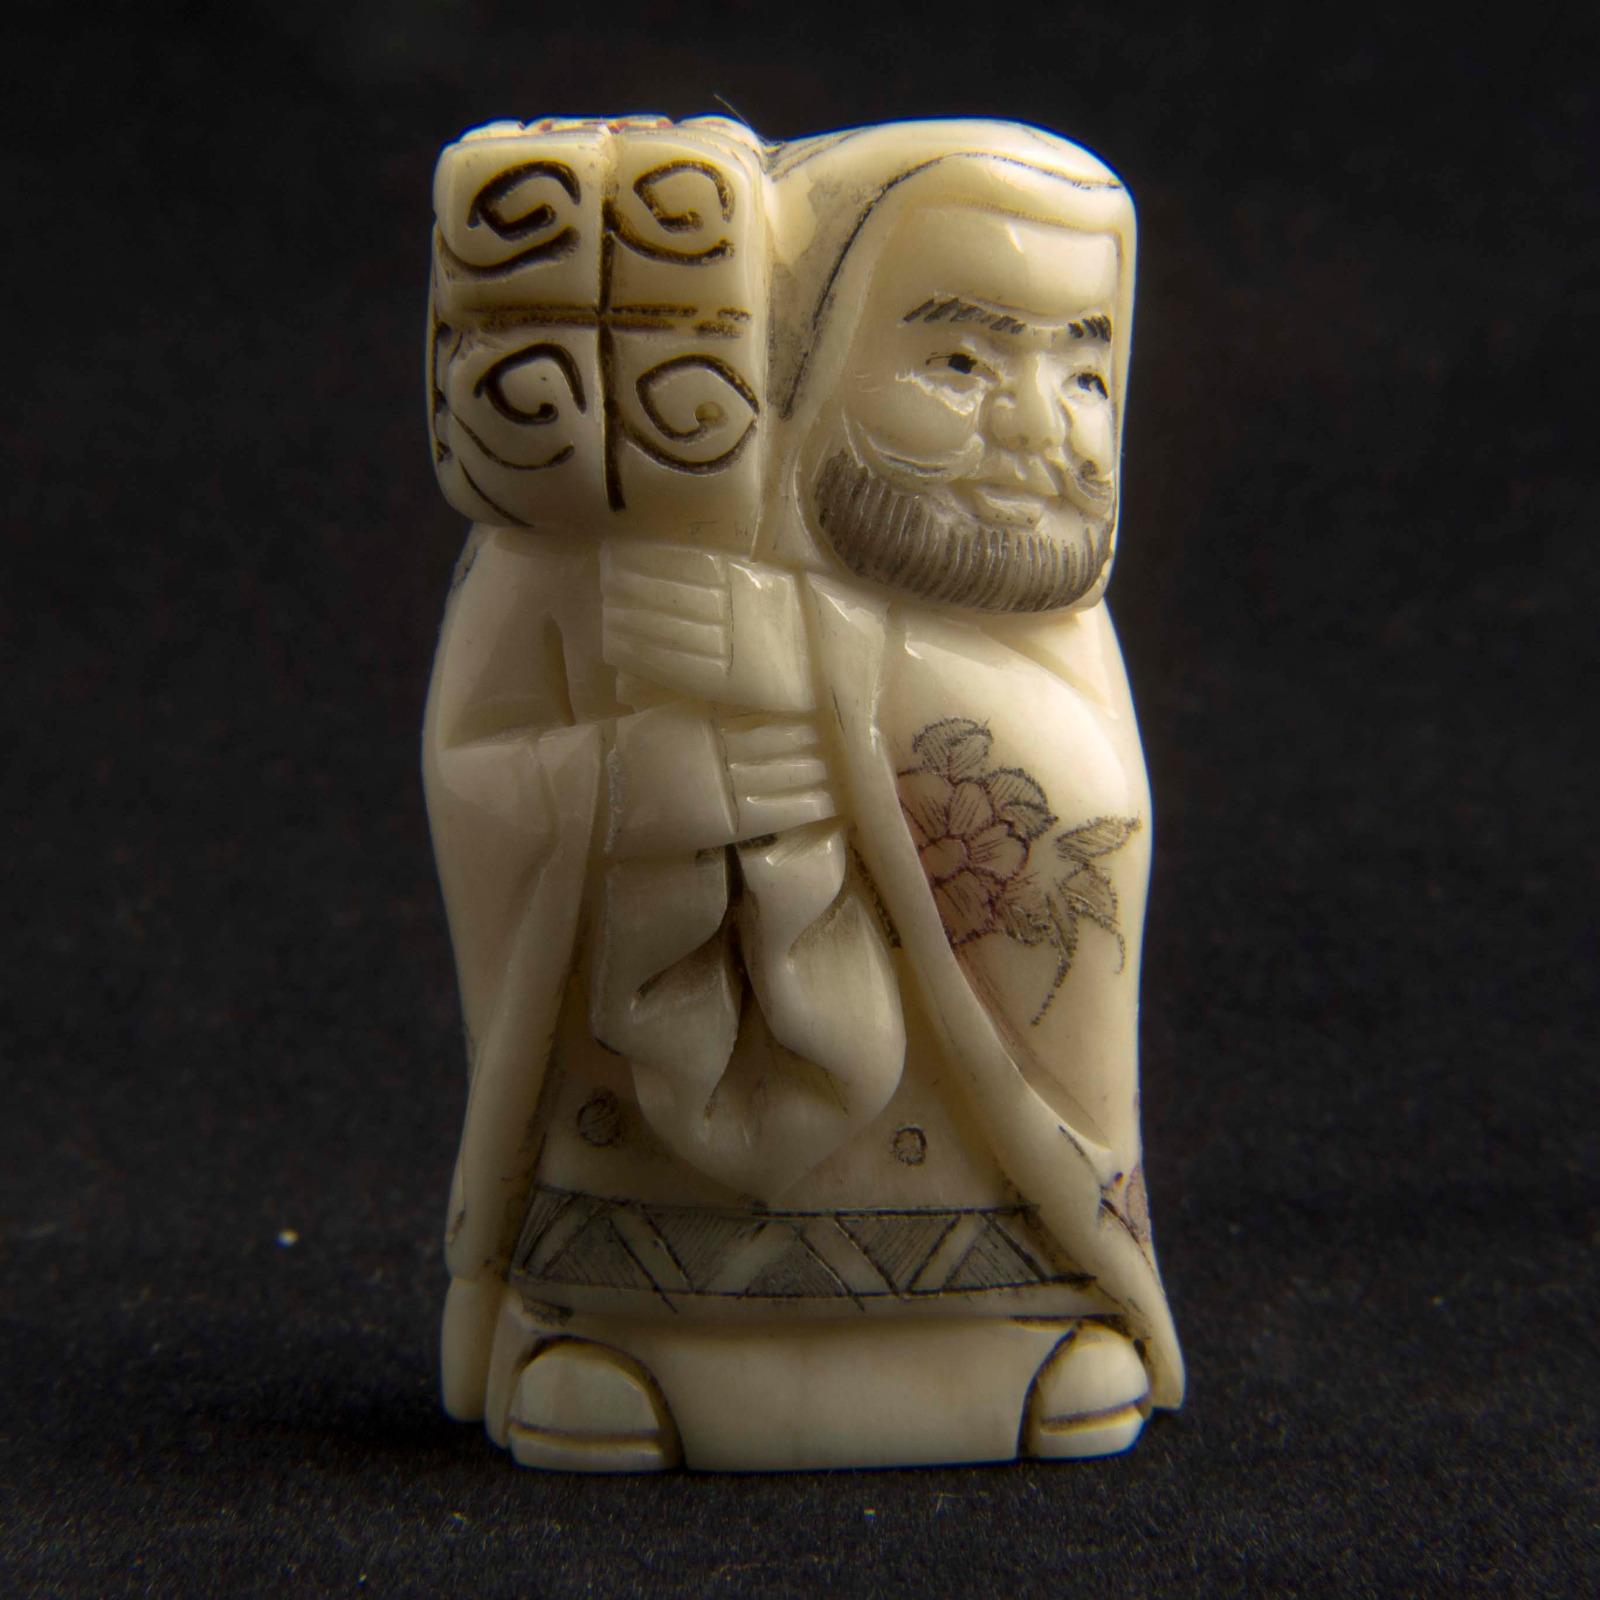 Japanese Carved Bone Netsuke 3209 La180385 Loveantiques Com